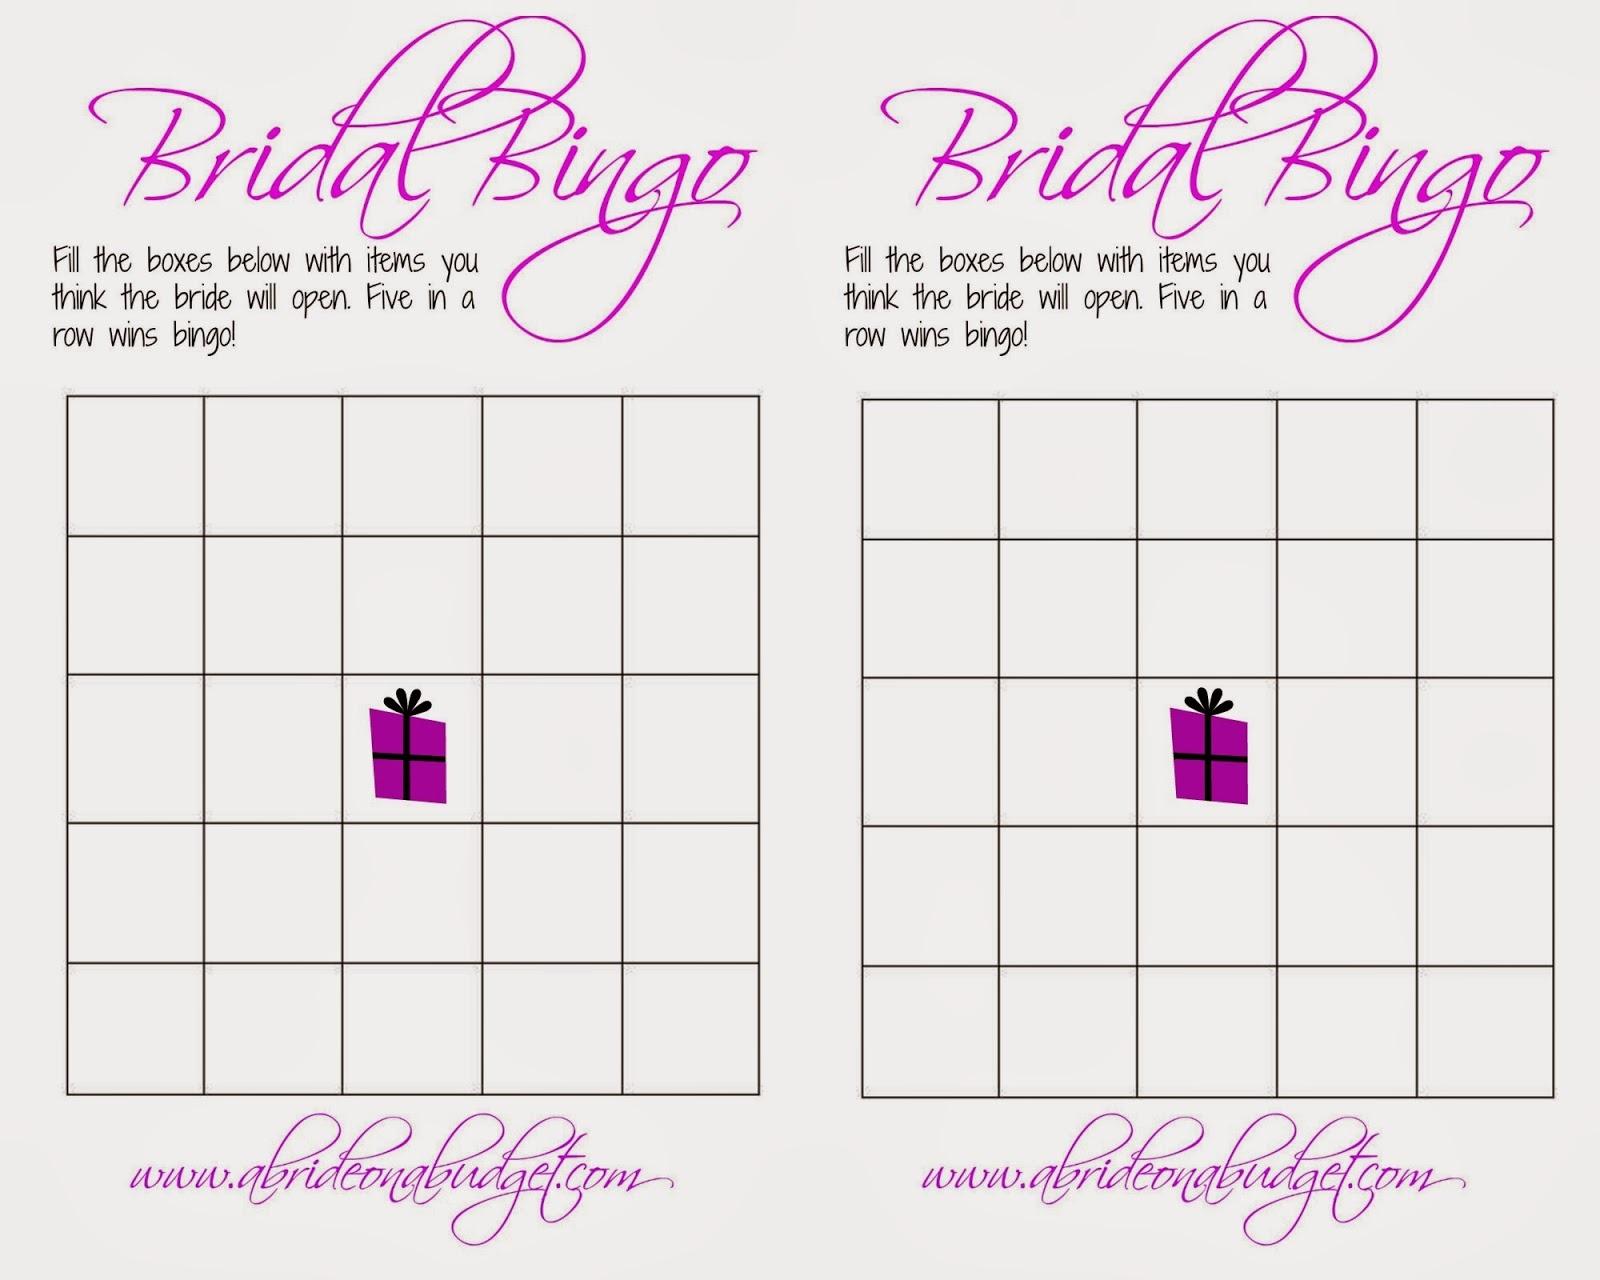 Photo : Free Printable Bridal Shower Image - Free Printable Bridal Shower Bingo